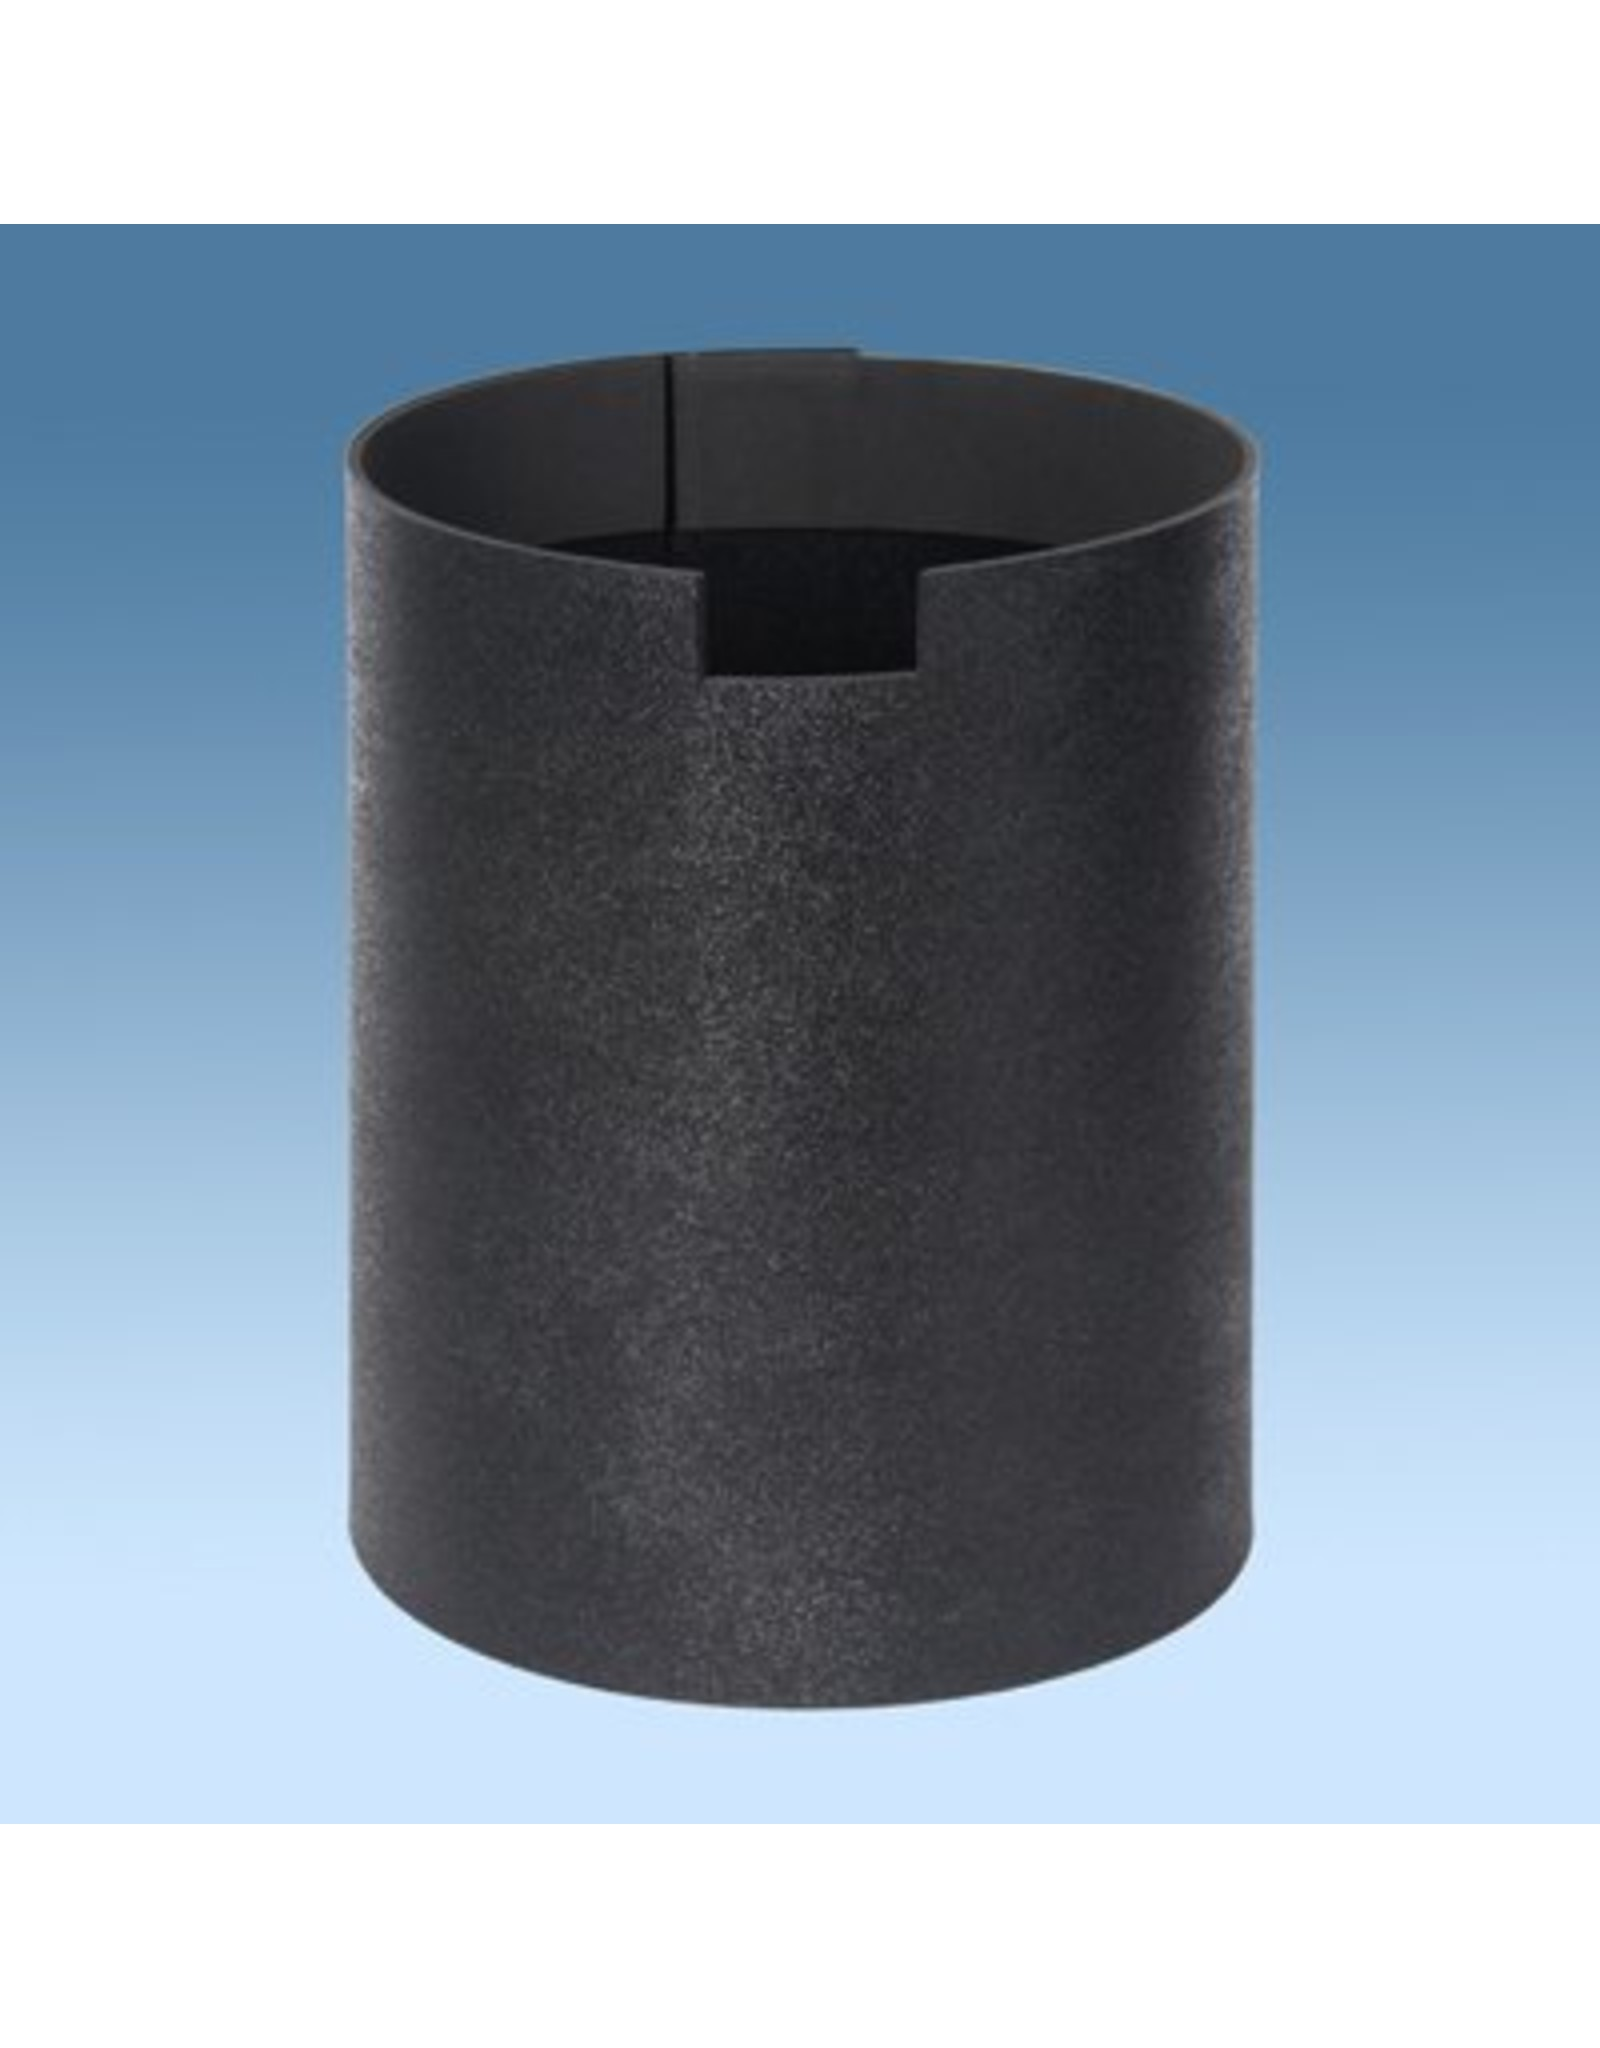 Astrozap Celestron 5SE SCT Flexi-Shield™ Flexible Dew Shield - with Notch for Side Bar